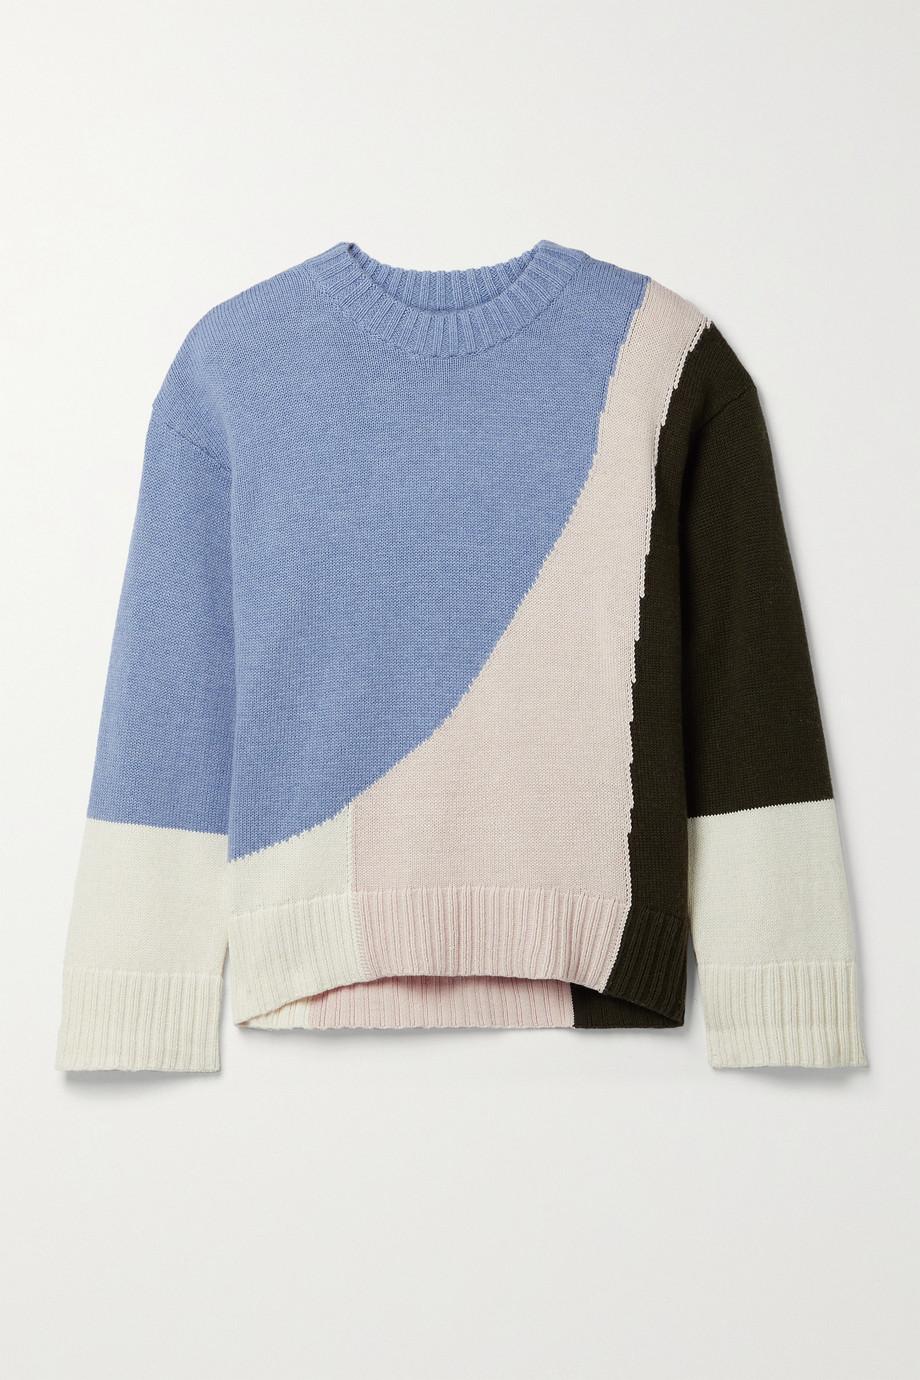 APIECE APART Shasta color-block organic cotton and cashmere-blend sweater